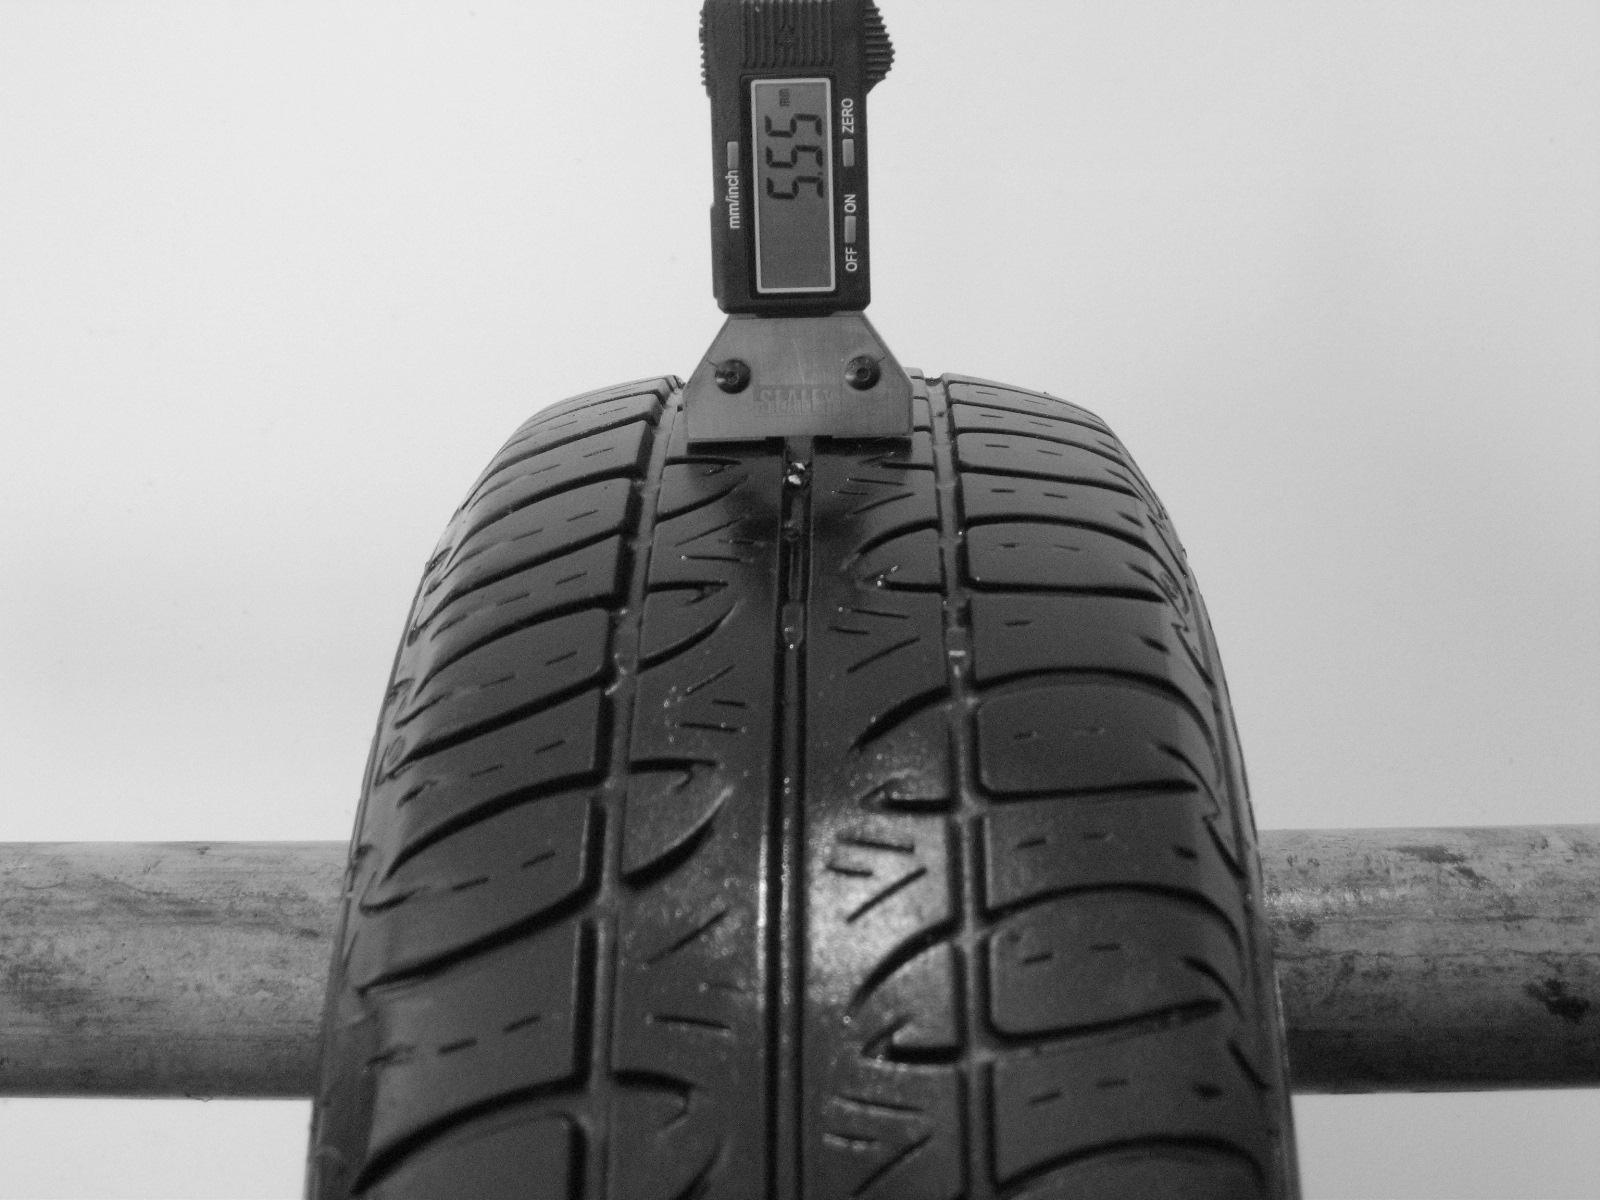 Použité-Pneu-Bazar - 165/65 R13 SEMPERIT COMFORT-LIFE -kusovka-rezerva 3mm